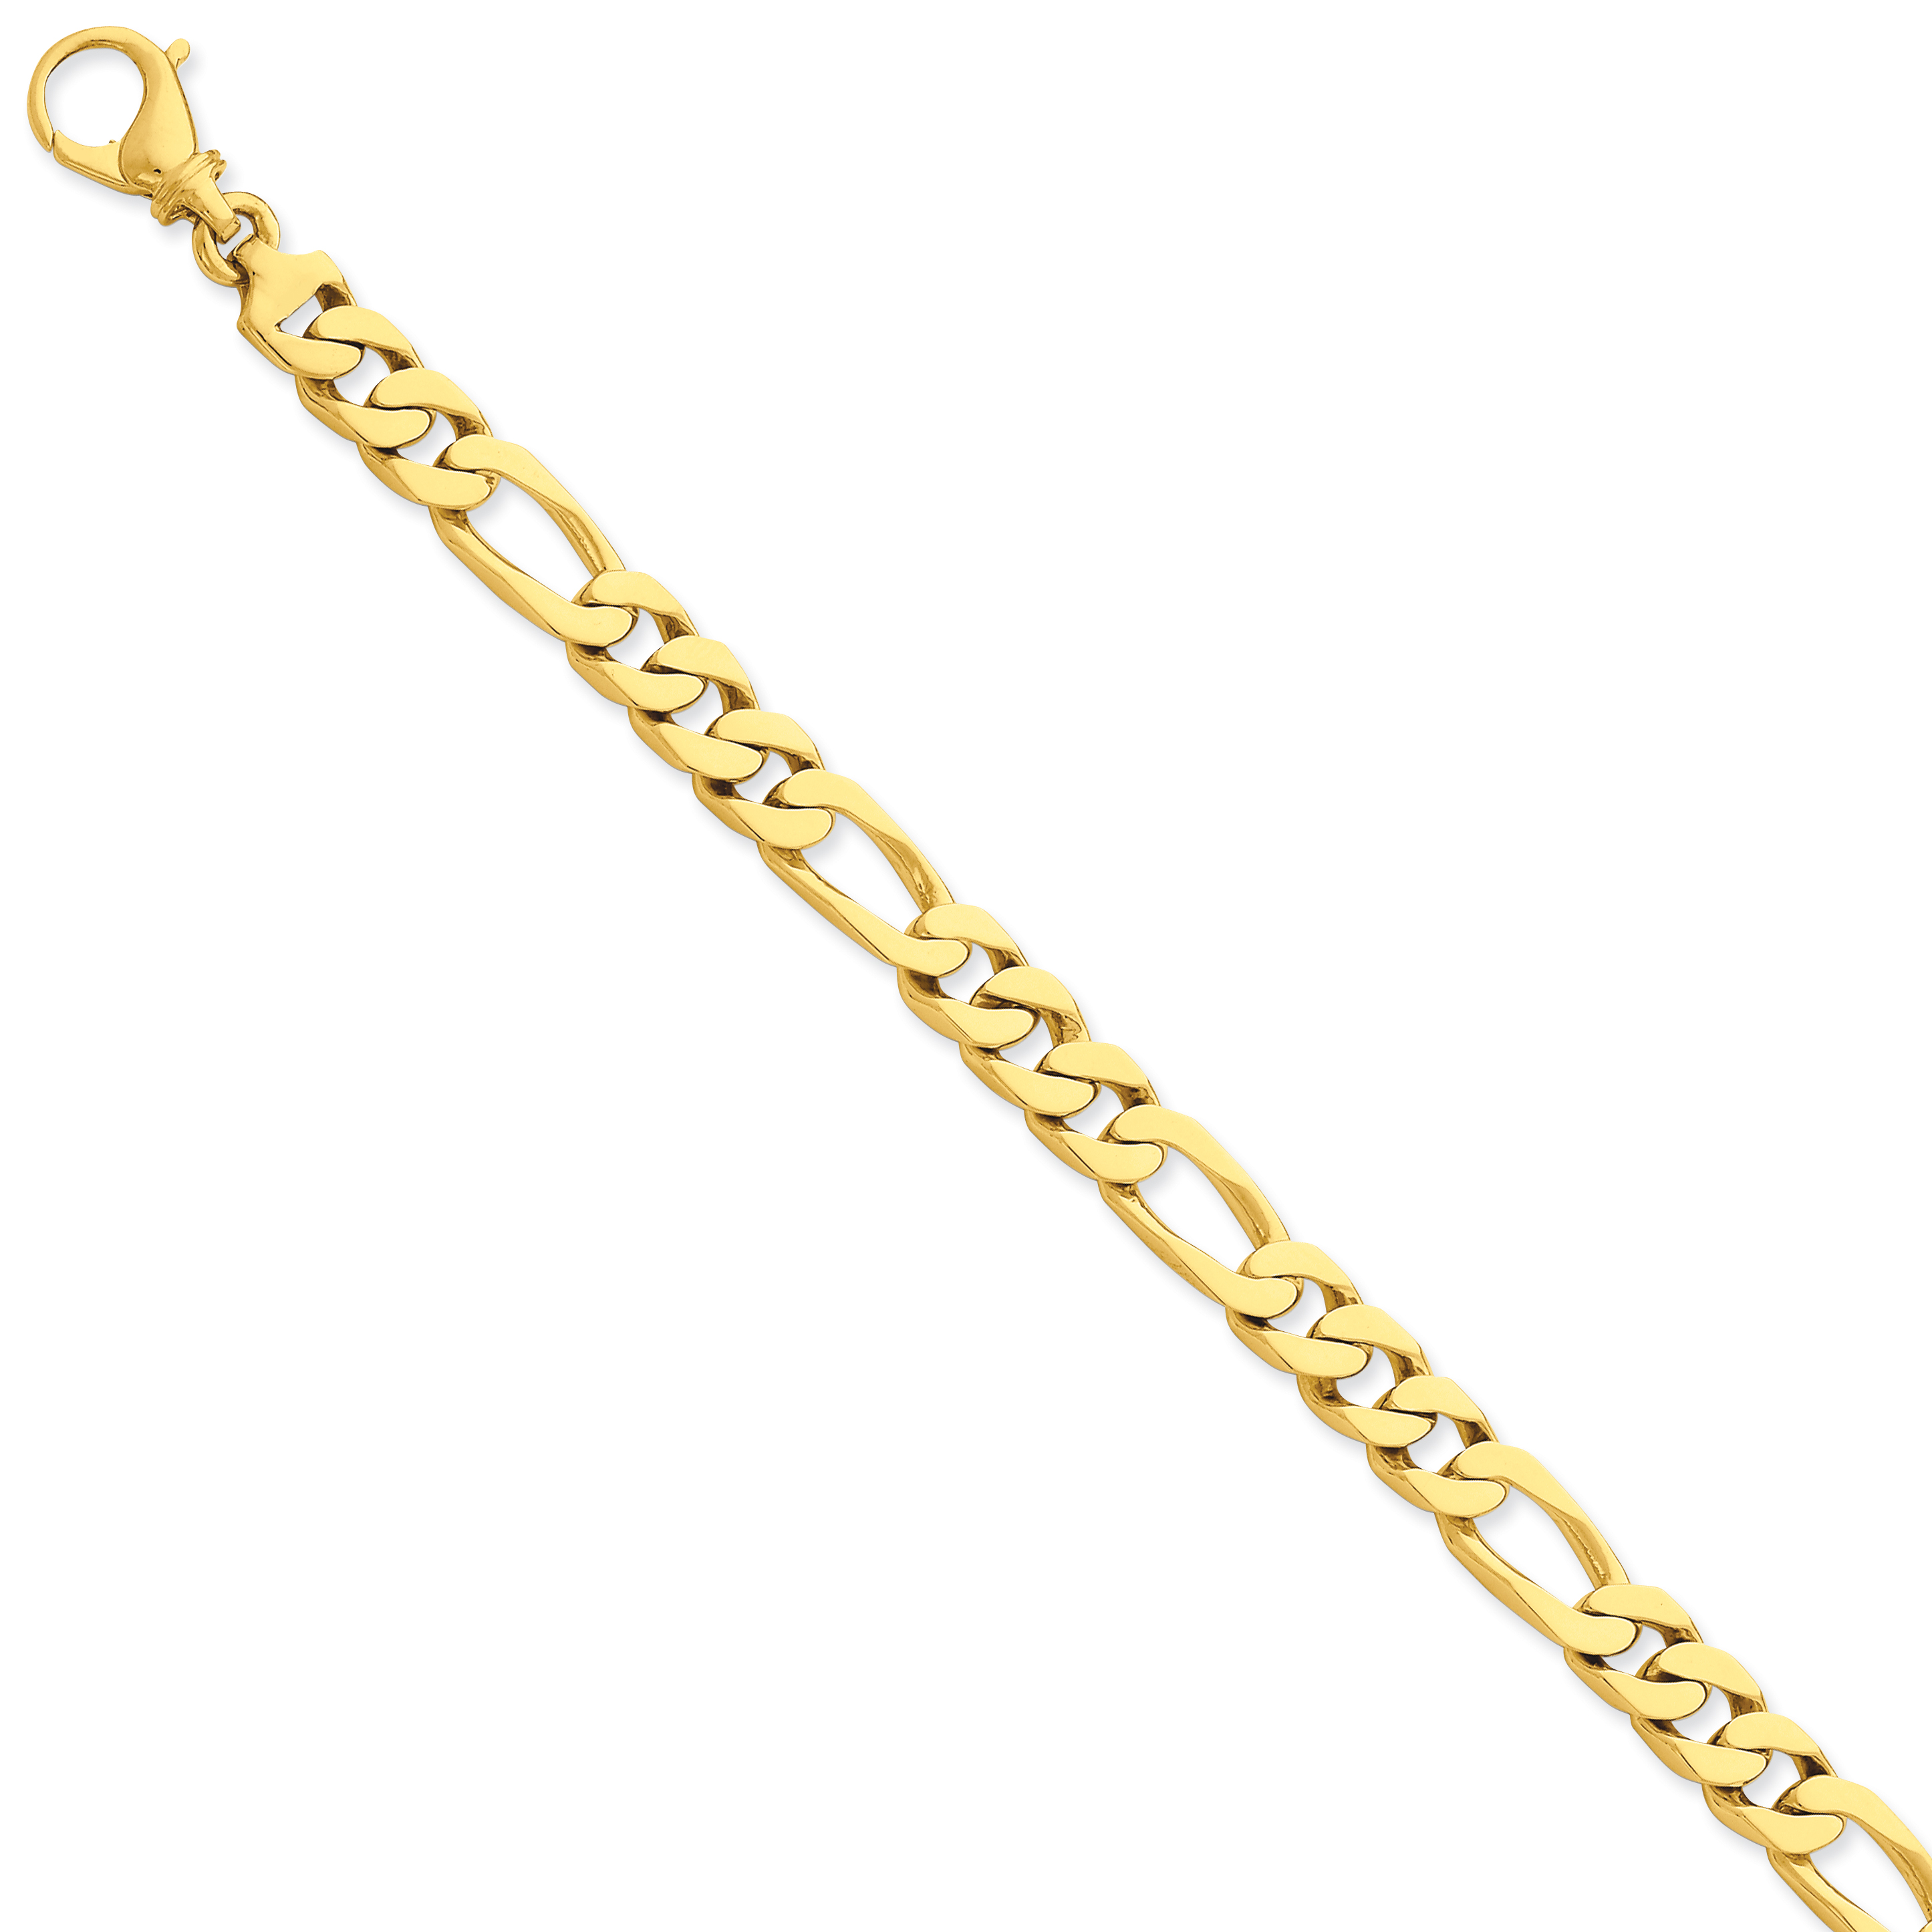 14K Yellow Gold 8.8mm Polished Fancy Link Bracelet - image 2 de 2